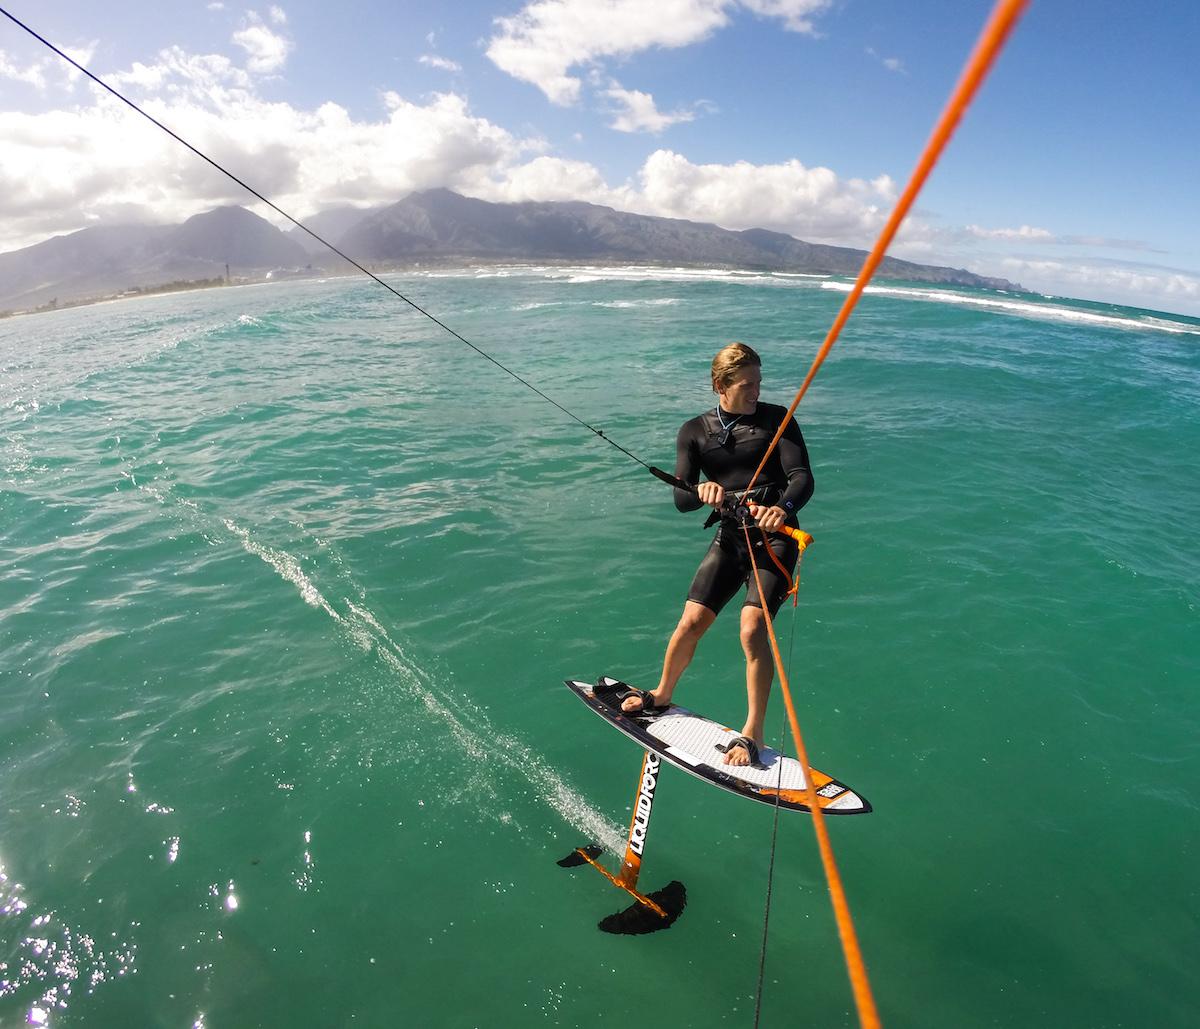 Brandon Scheid doing R&D work on Maui for the Liquid Force Foil Fish.